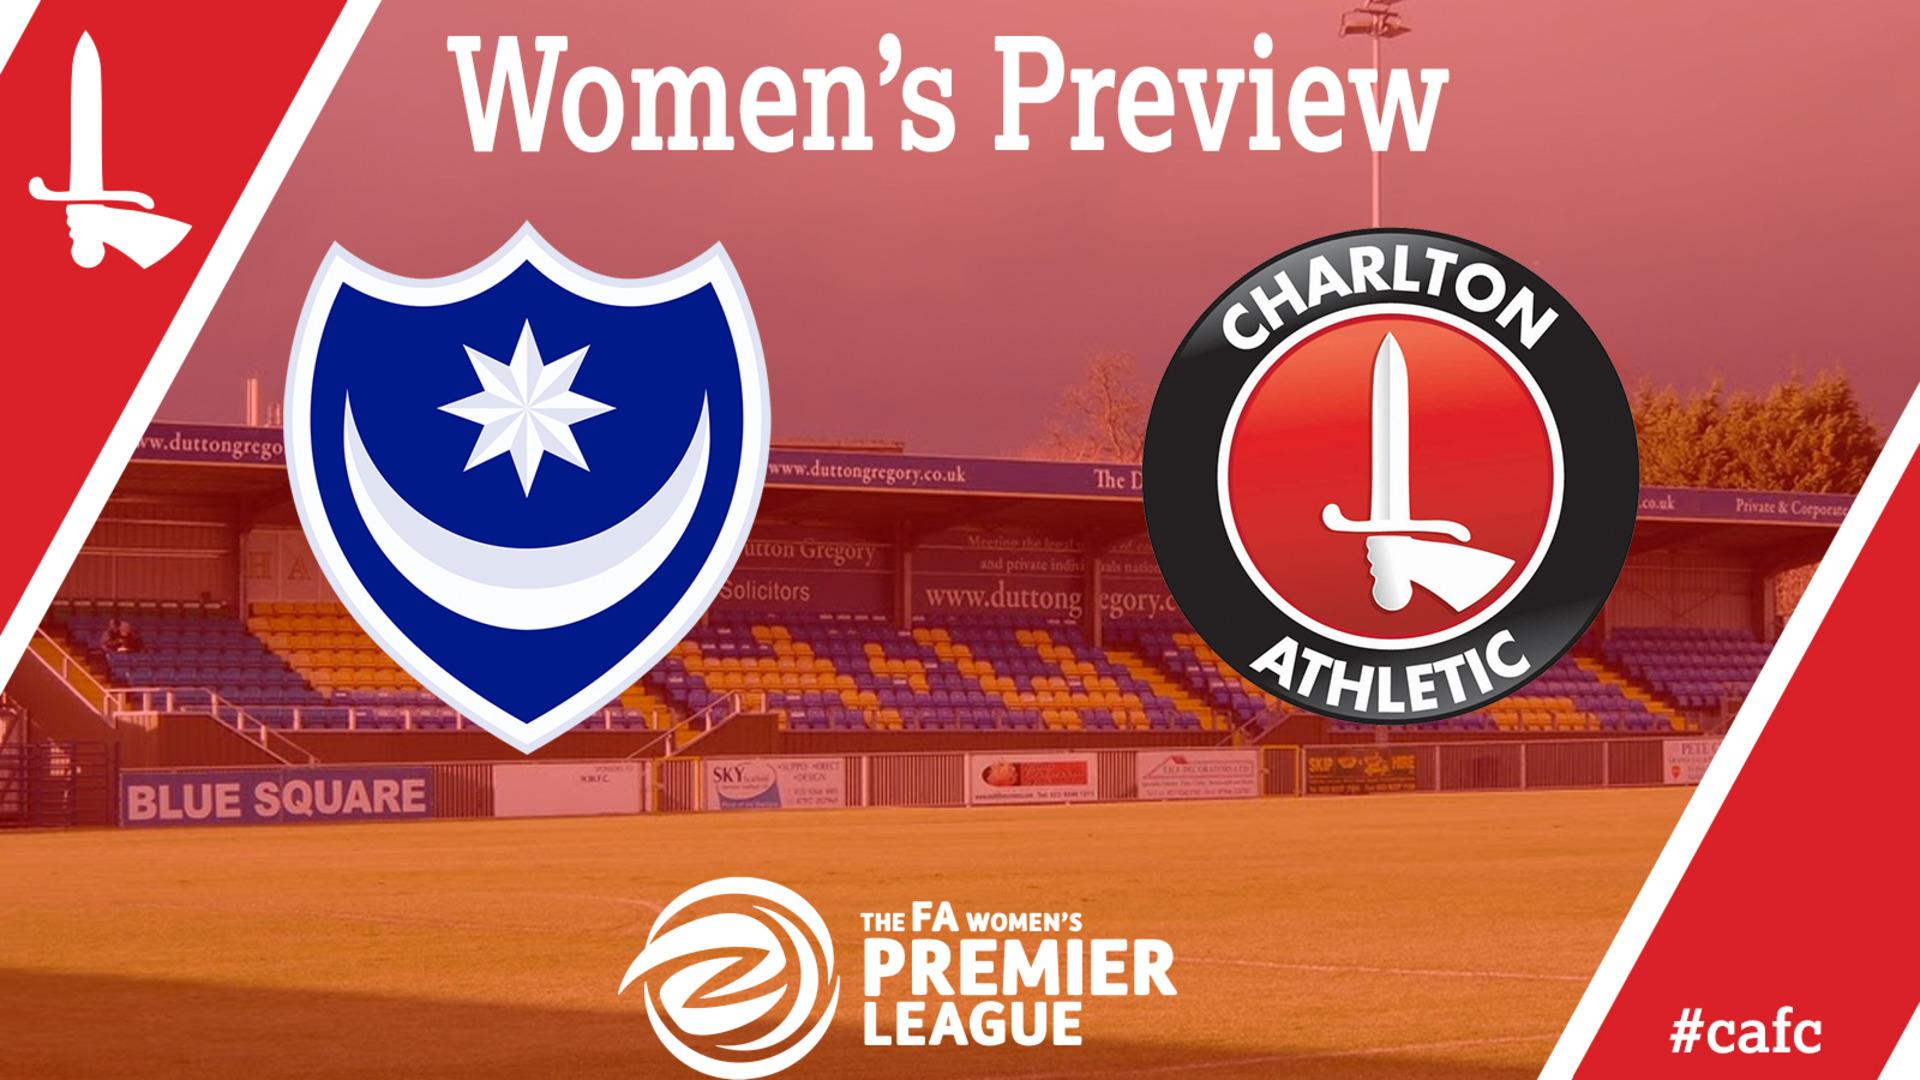 WOMEN'S PREVIEW | Portsmouth Ladies vs Charlton Women